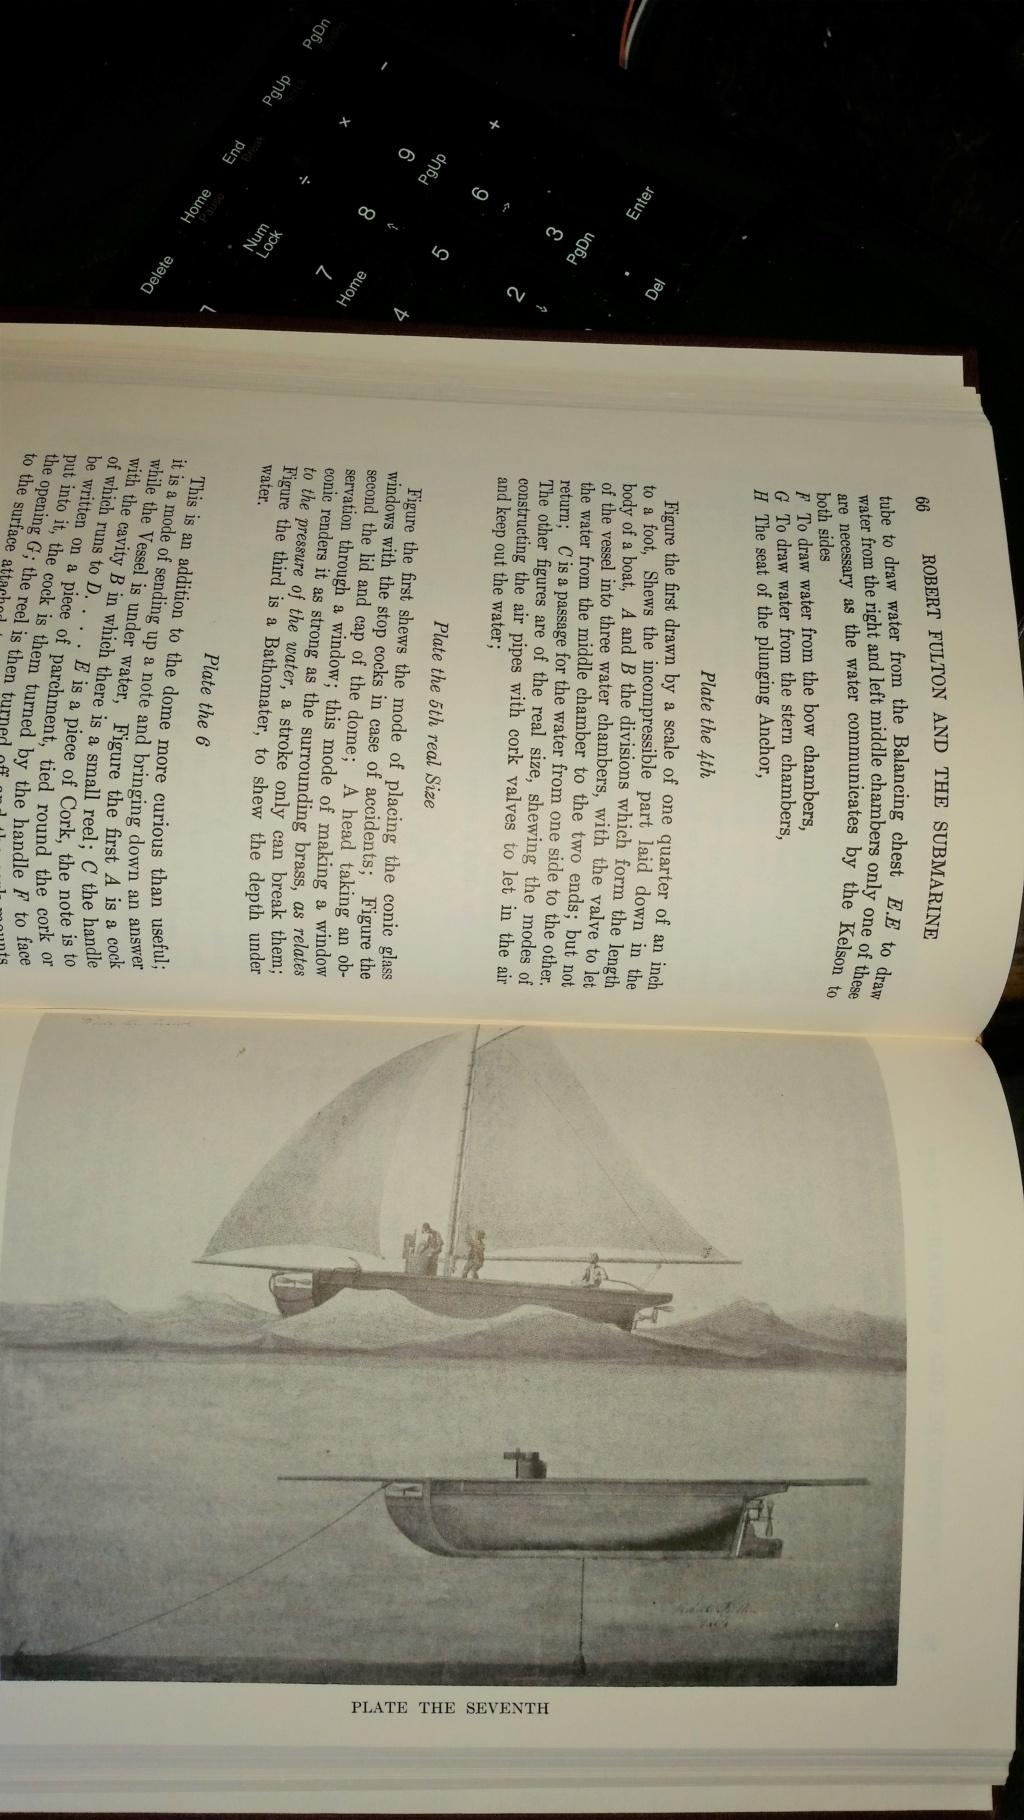 Nautilus II by Robert Fulton 20190615